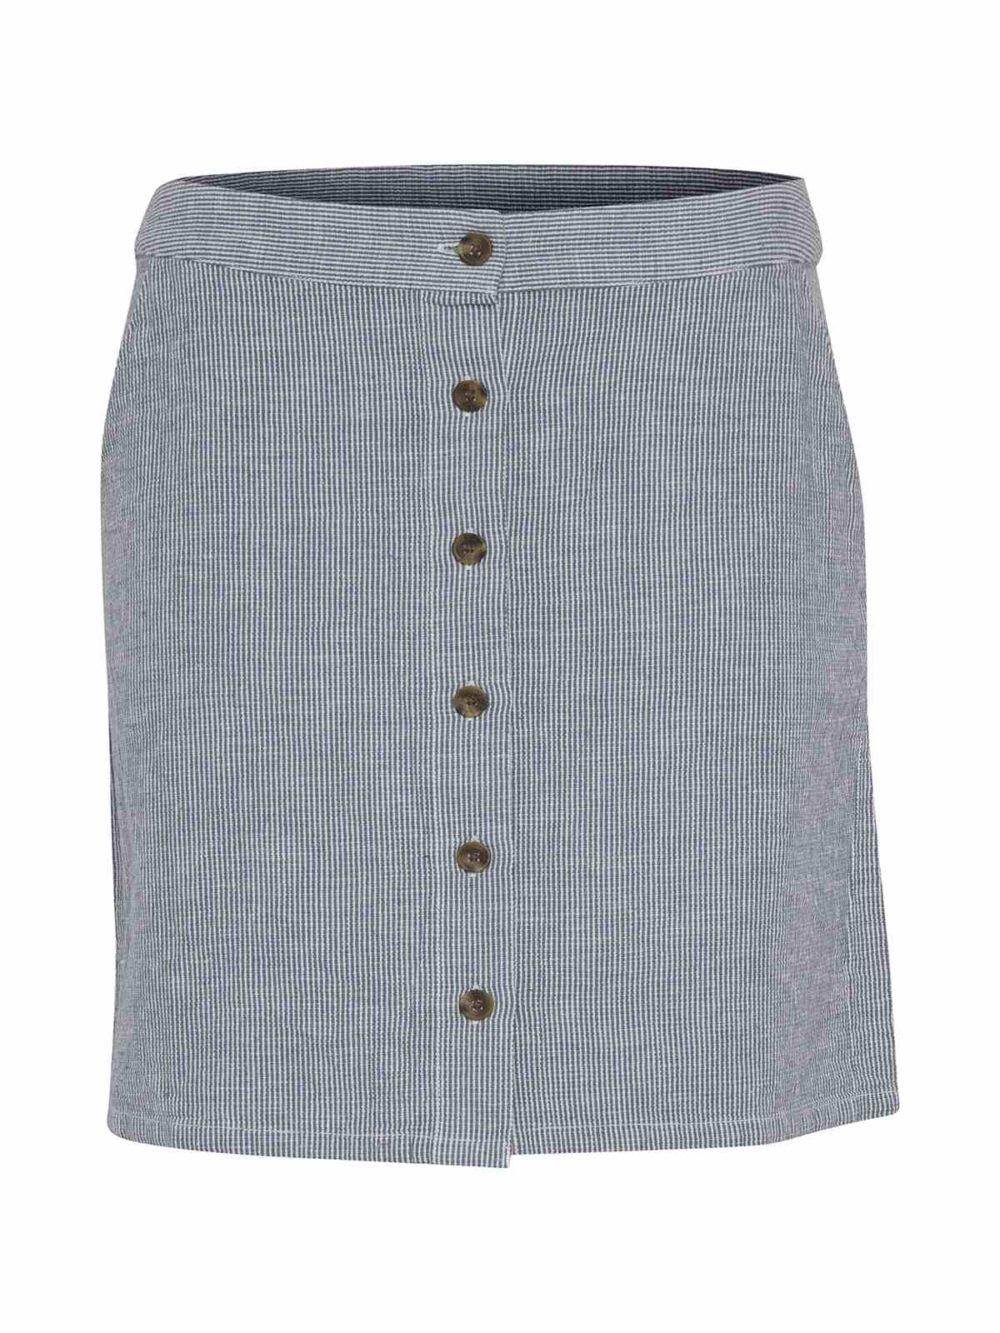 Halli Skirt ICHI Katie Kerr Women's Clothing